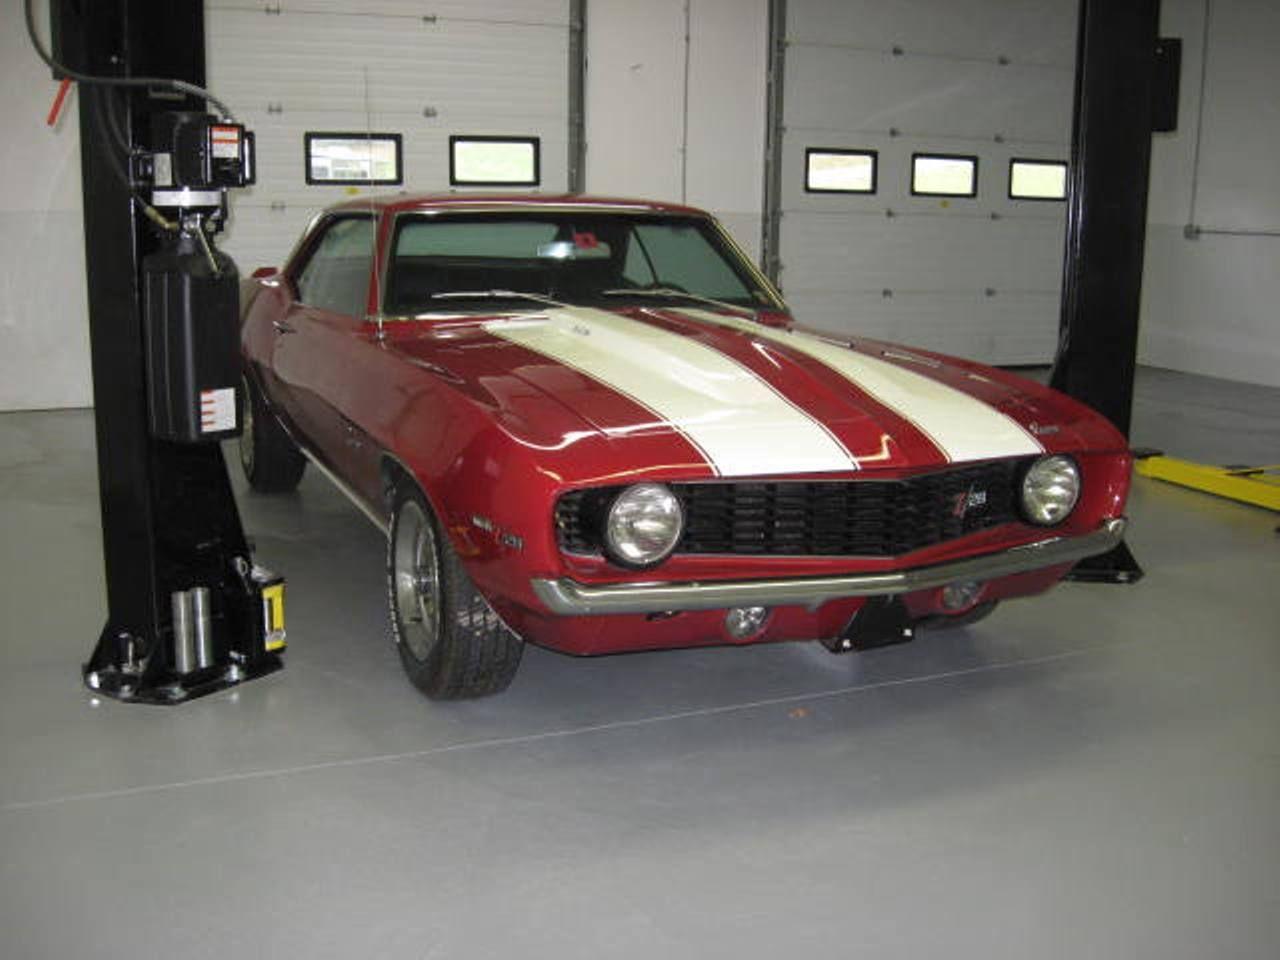 1969 Chevy Camaro Z28 Clone Muscle Car Sold on StreetRodding.com ...